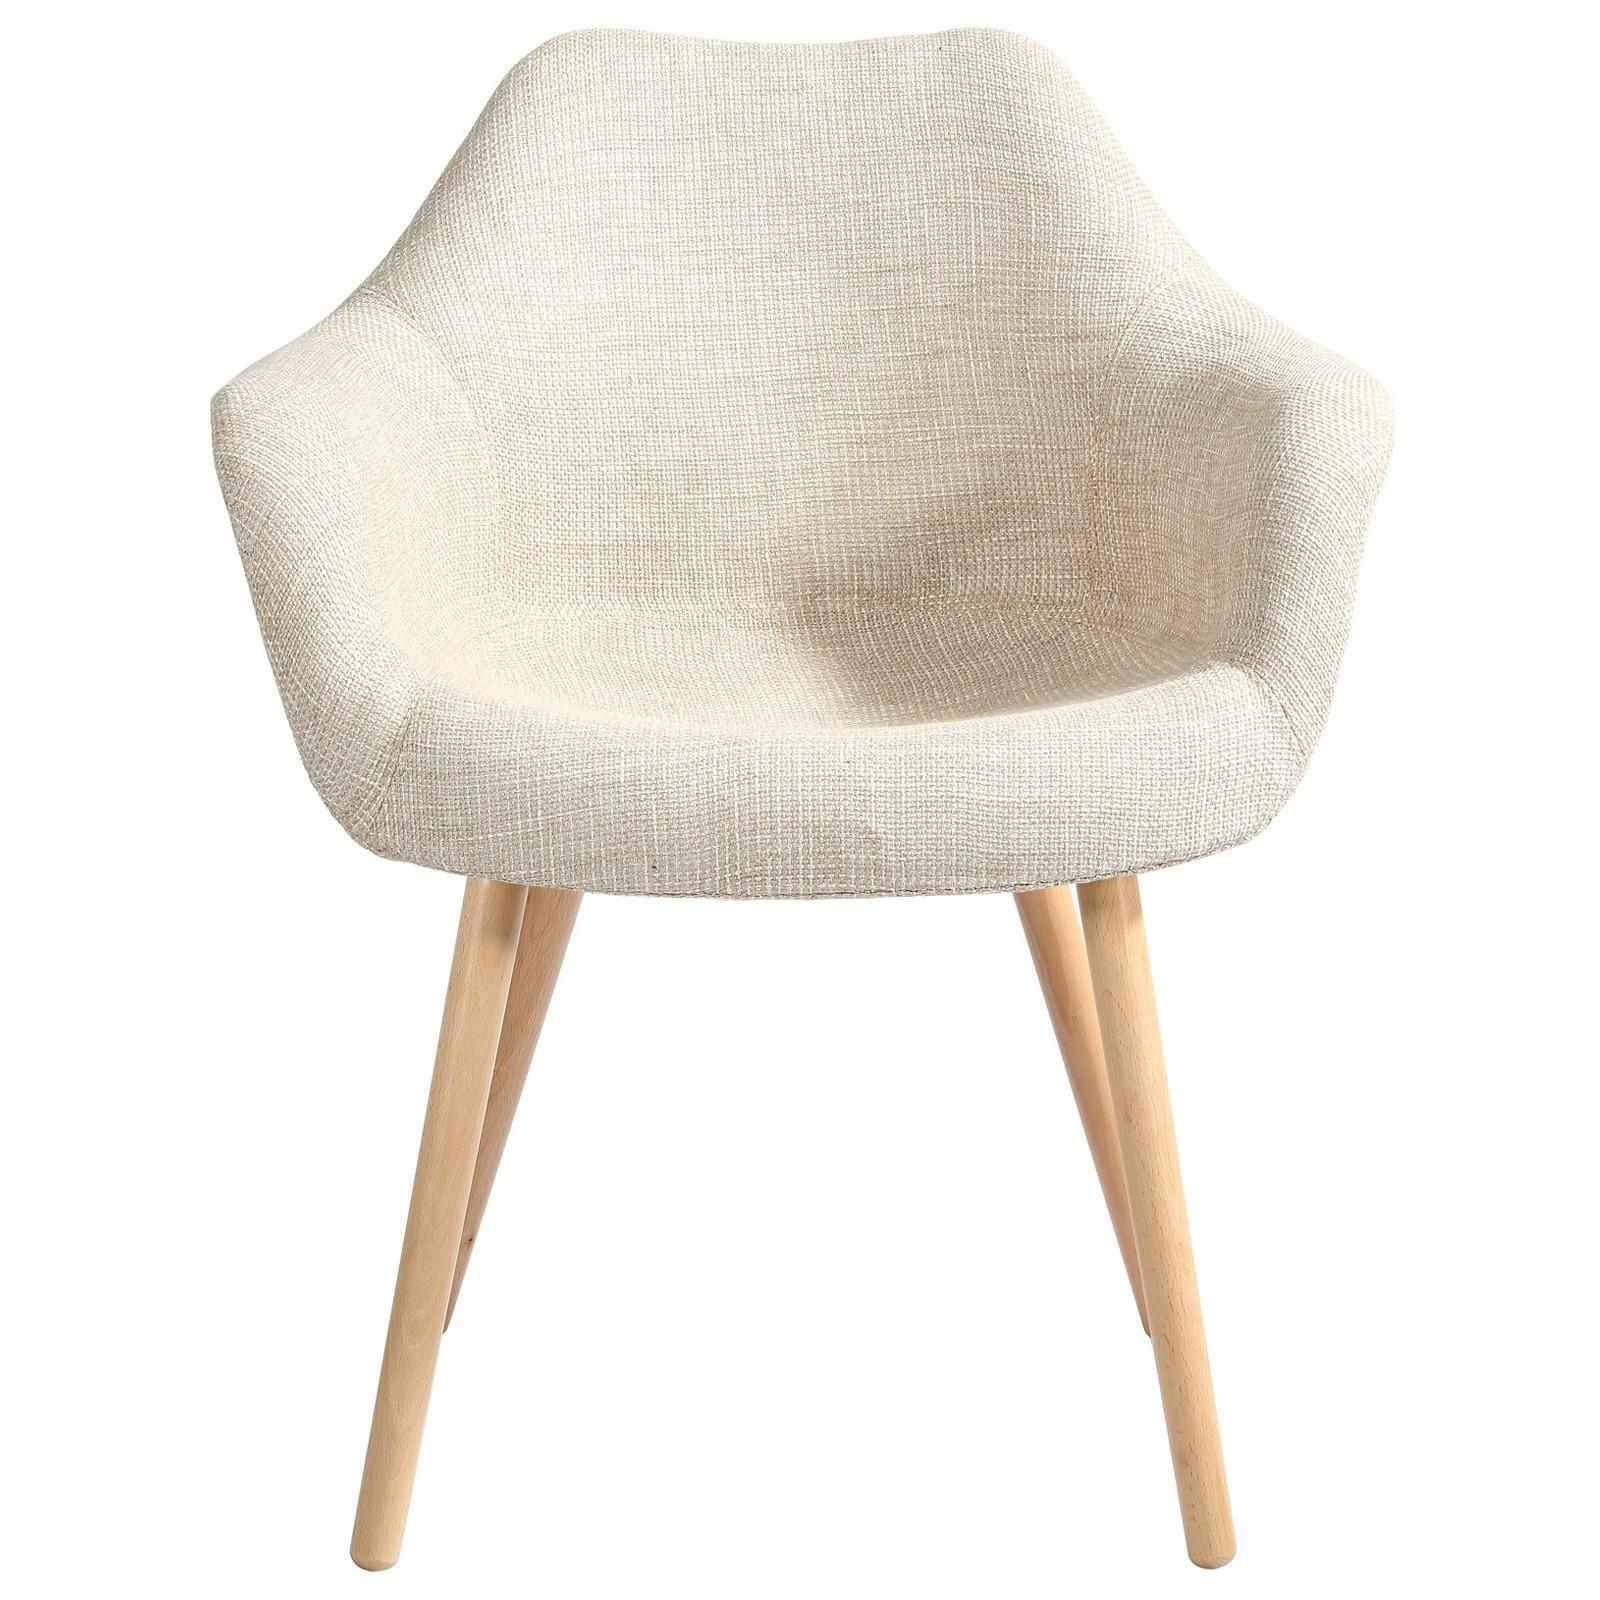 acheter chaise beige prix bas